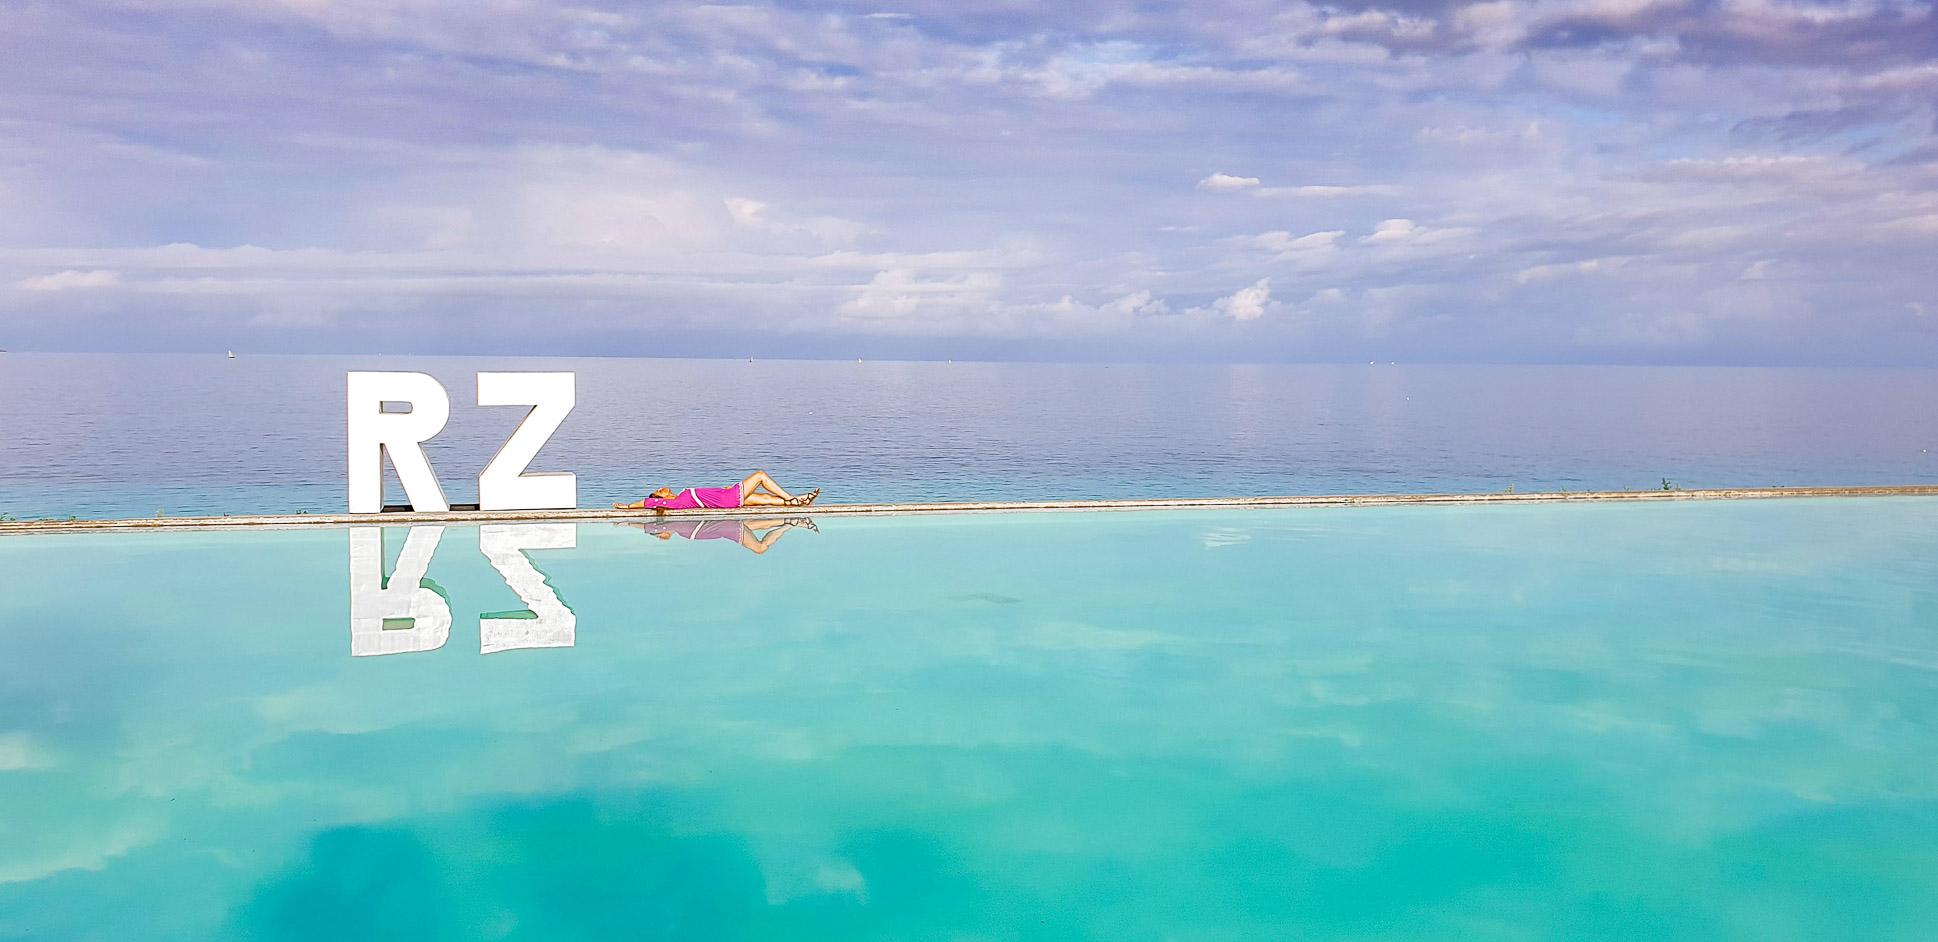 royal zanzibar beach resort alojamientos en zanzibar (2)